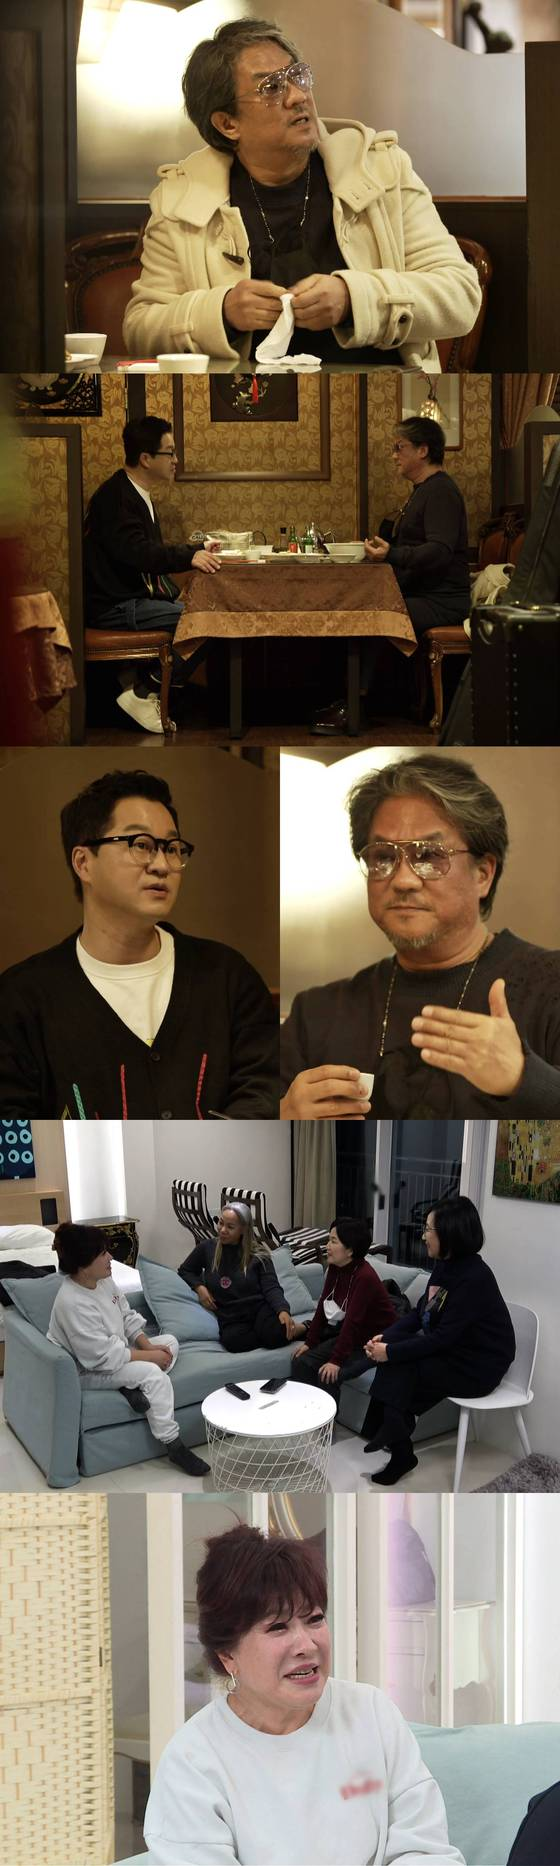 [N컷] 노사연과 이무송의 '브론즈 드림 2'졸업식 … 65 골드 베스트 프렌드와 대화